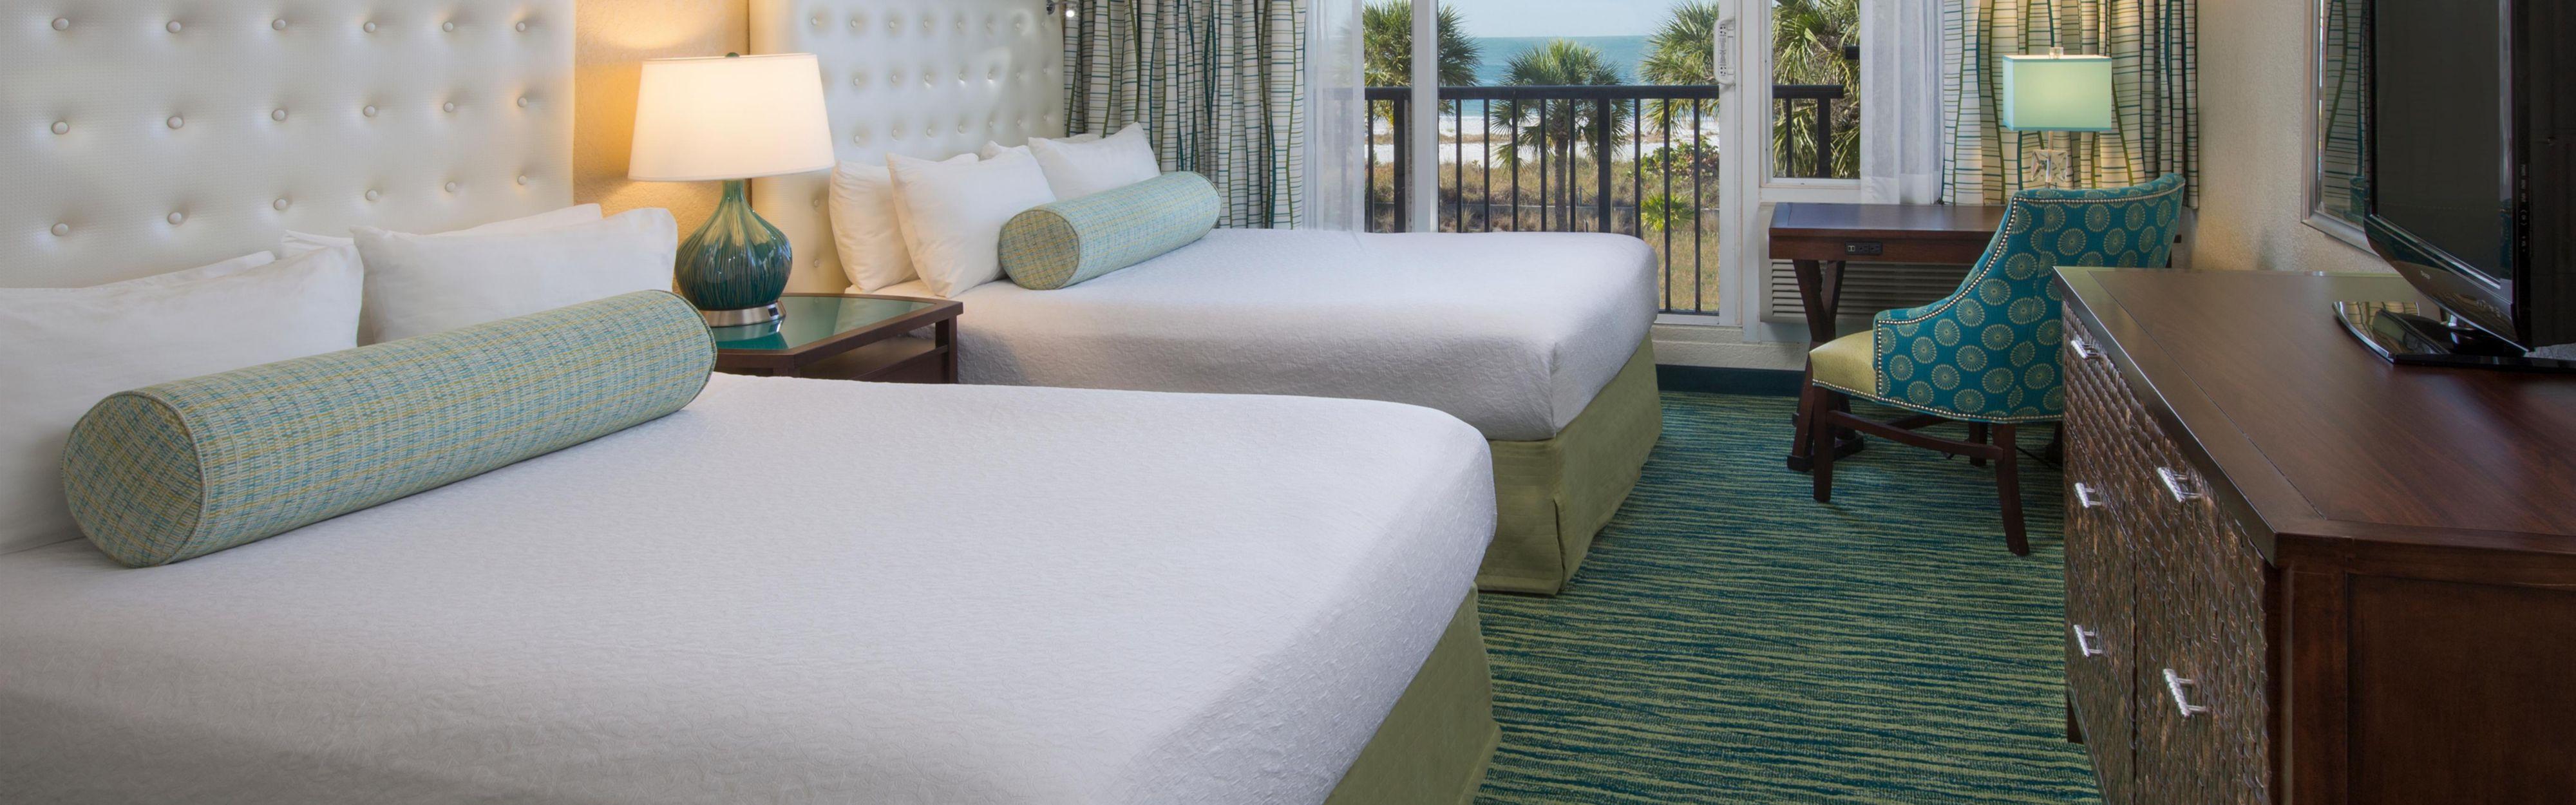 Holiday Inn Sarasota-Lido Beach-@The Beach image 1